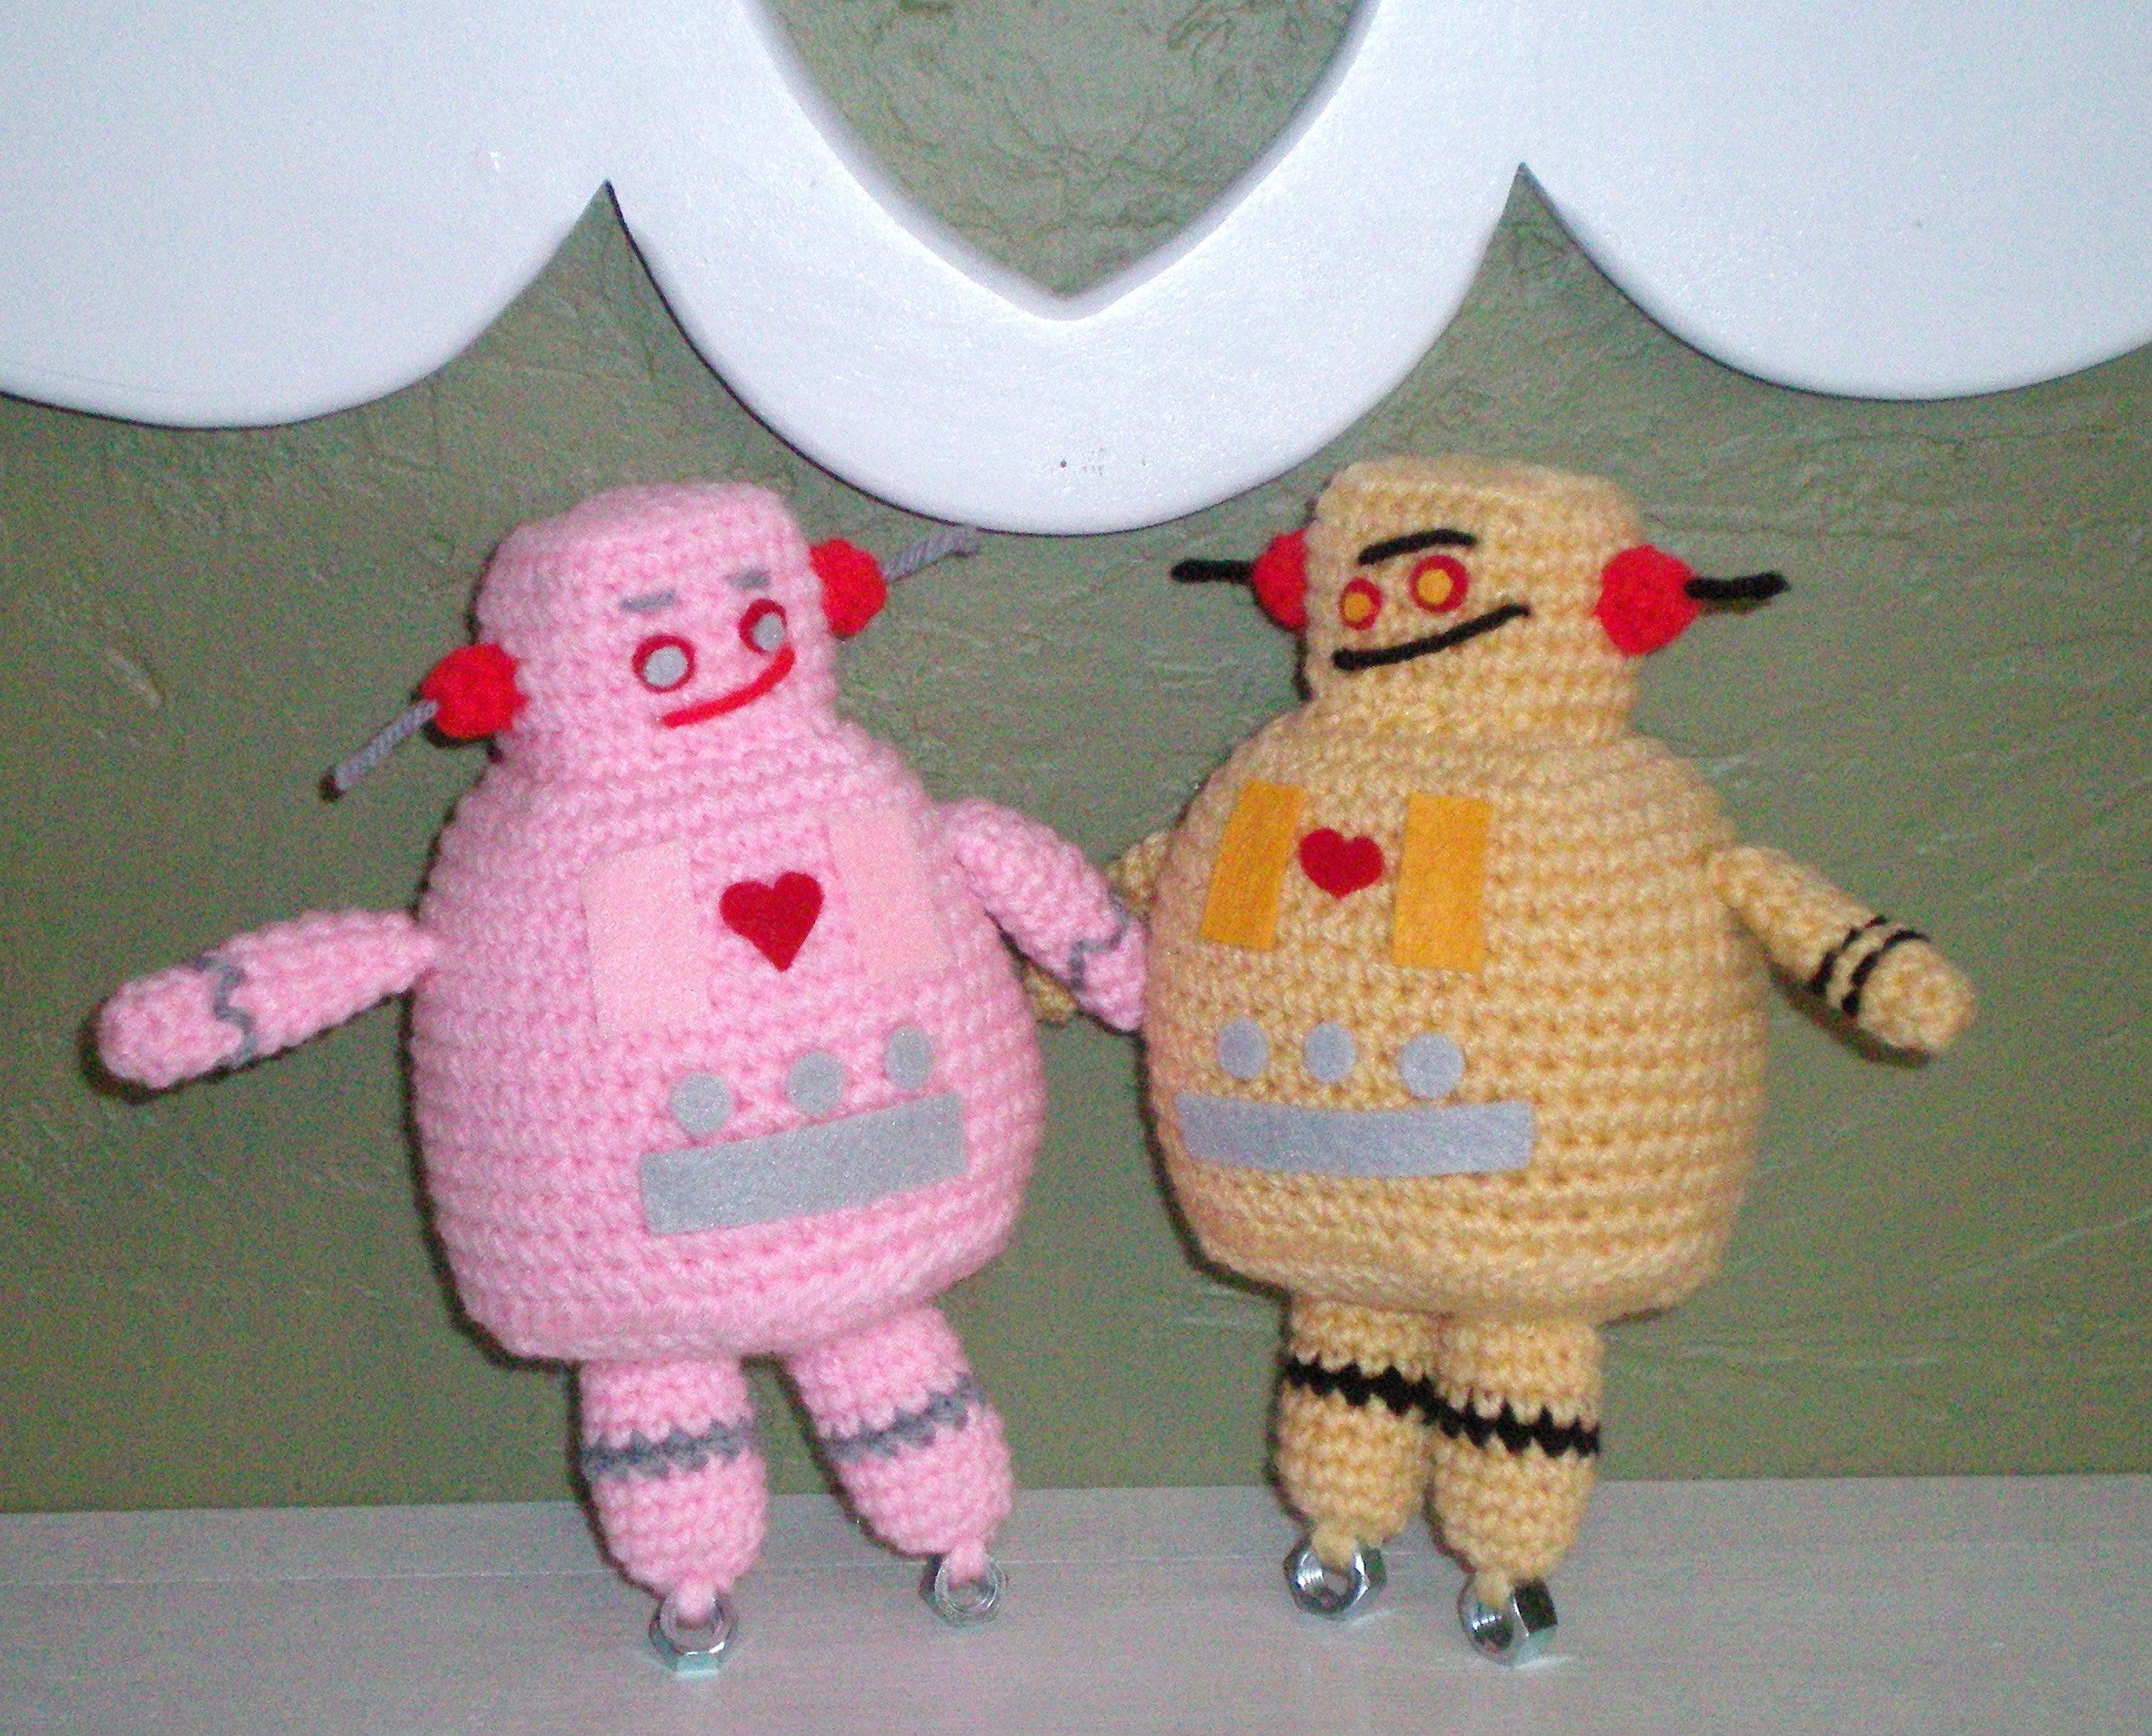 Domo Arigato, for 10 Free #Crochet Robot Patterns! | Free crochet ... | 2083x2582